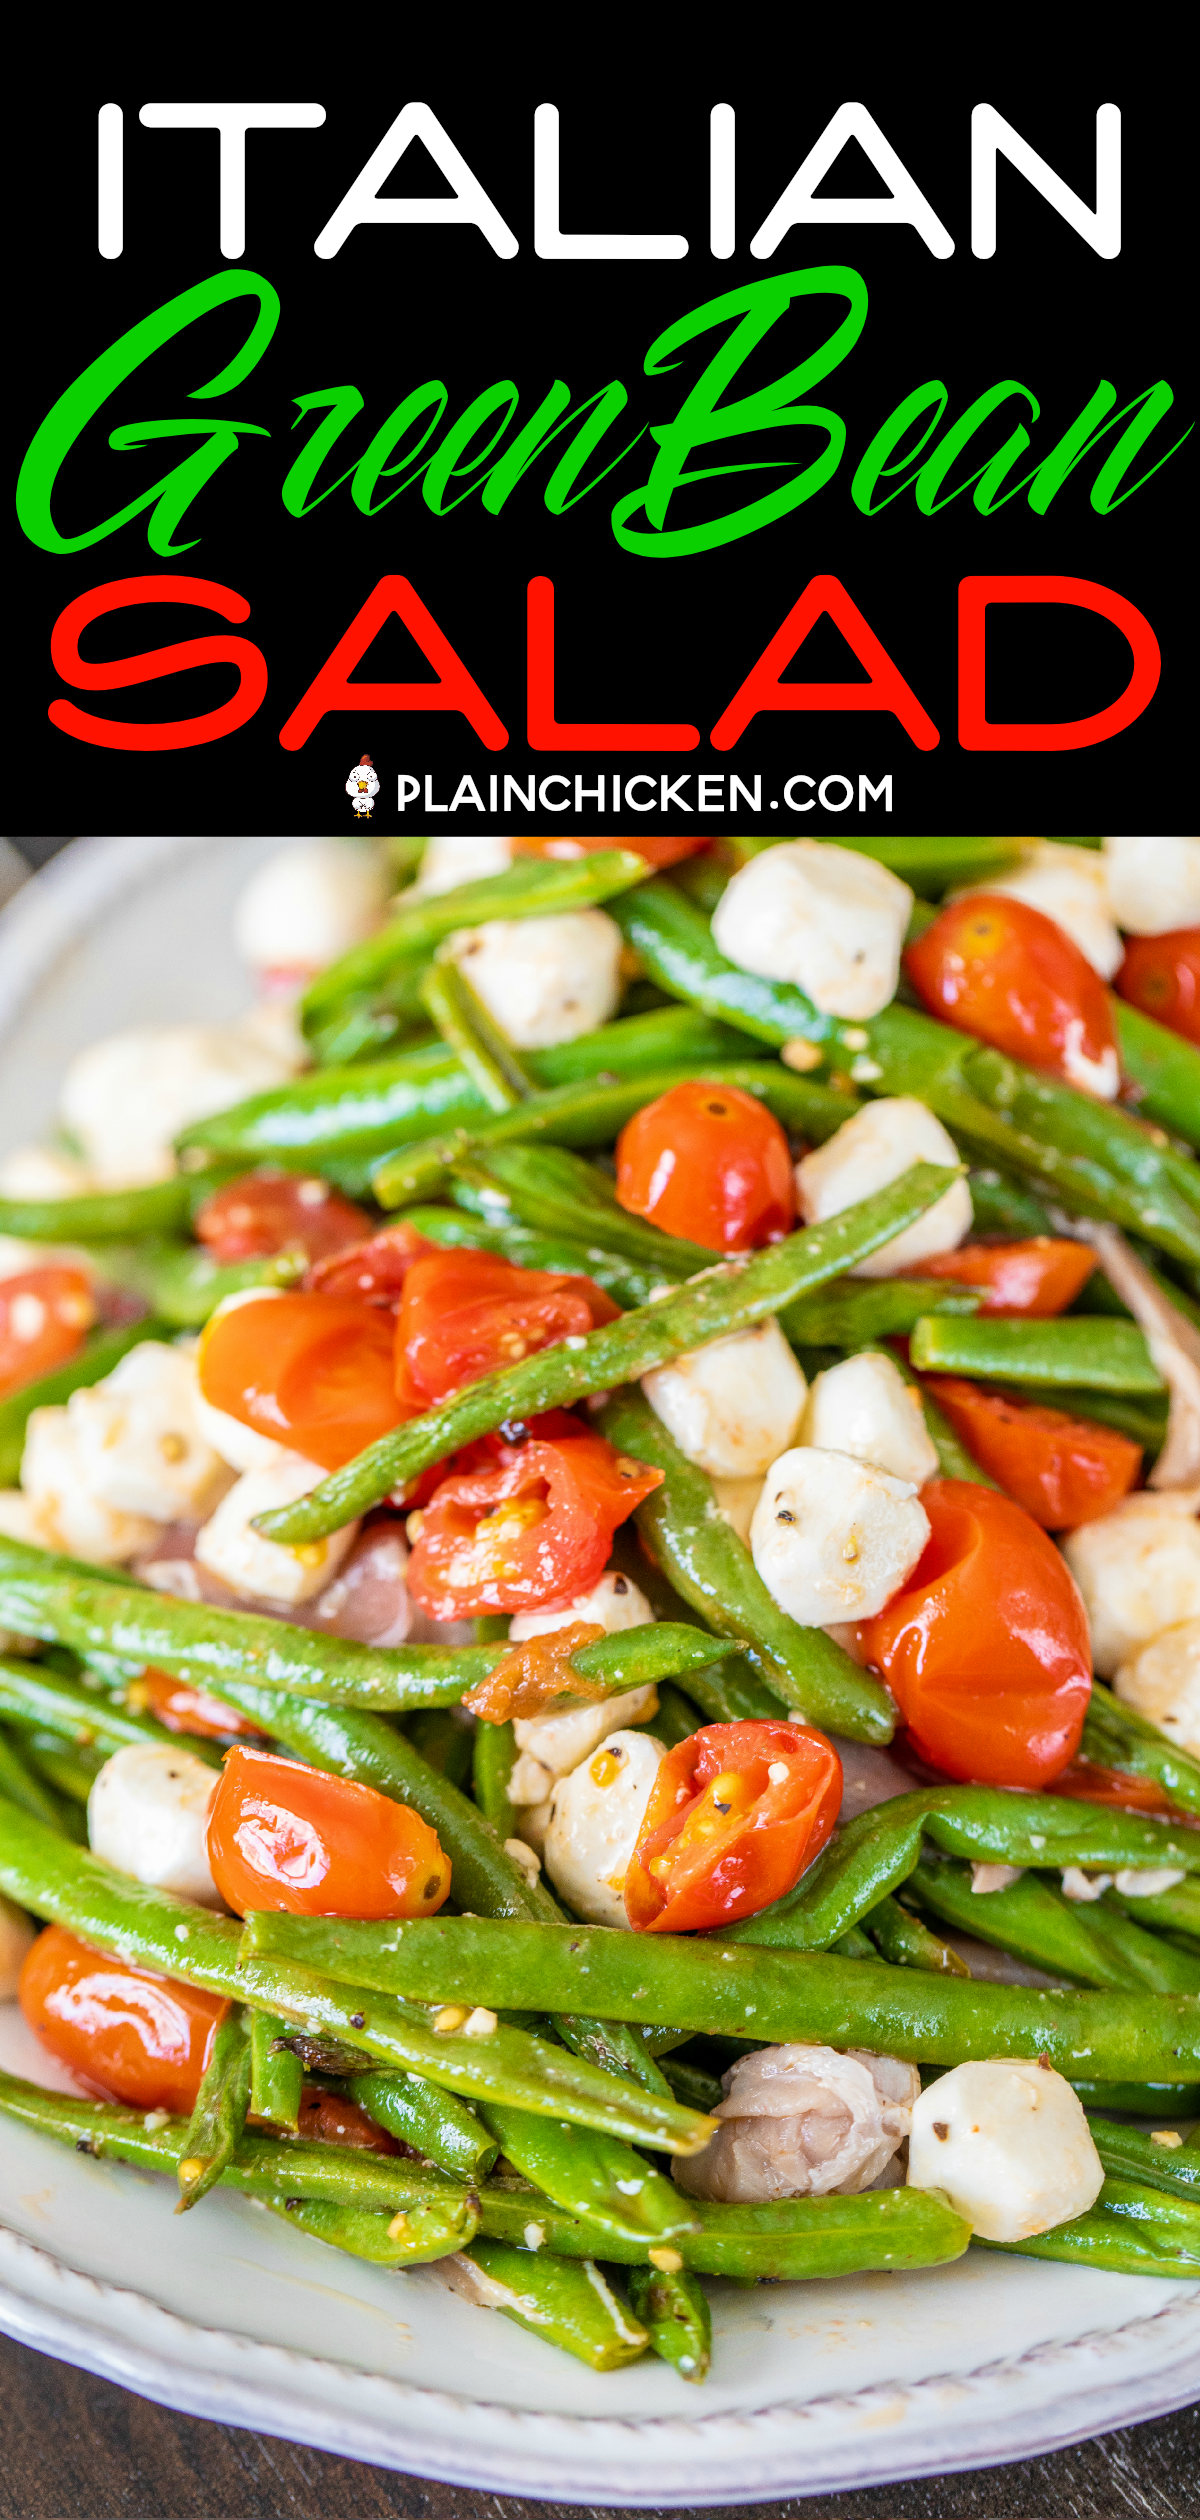 Hot Green Bean Salad Recipe